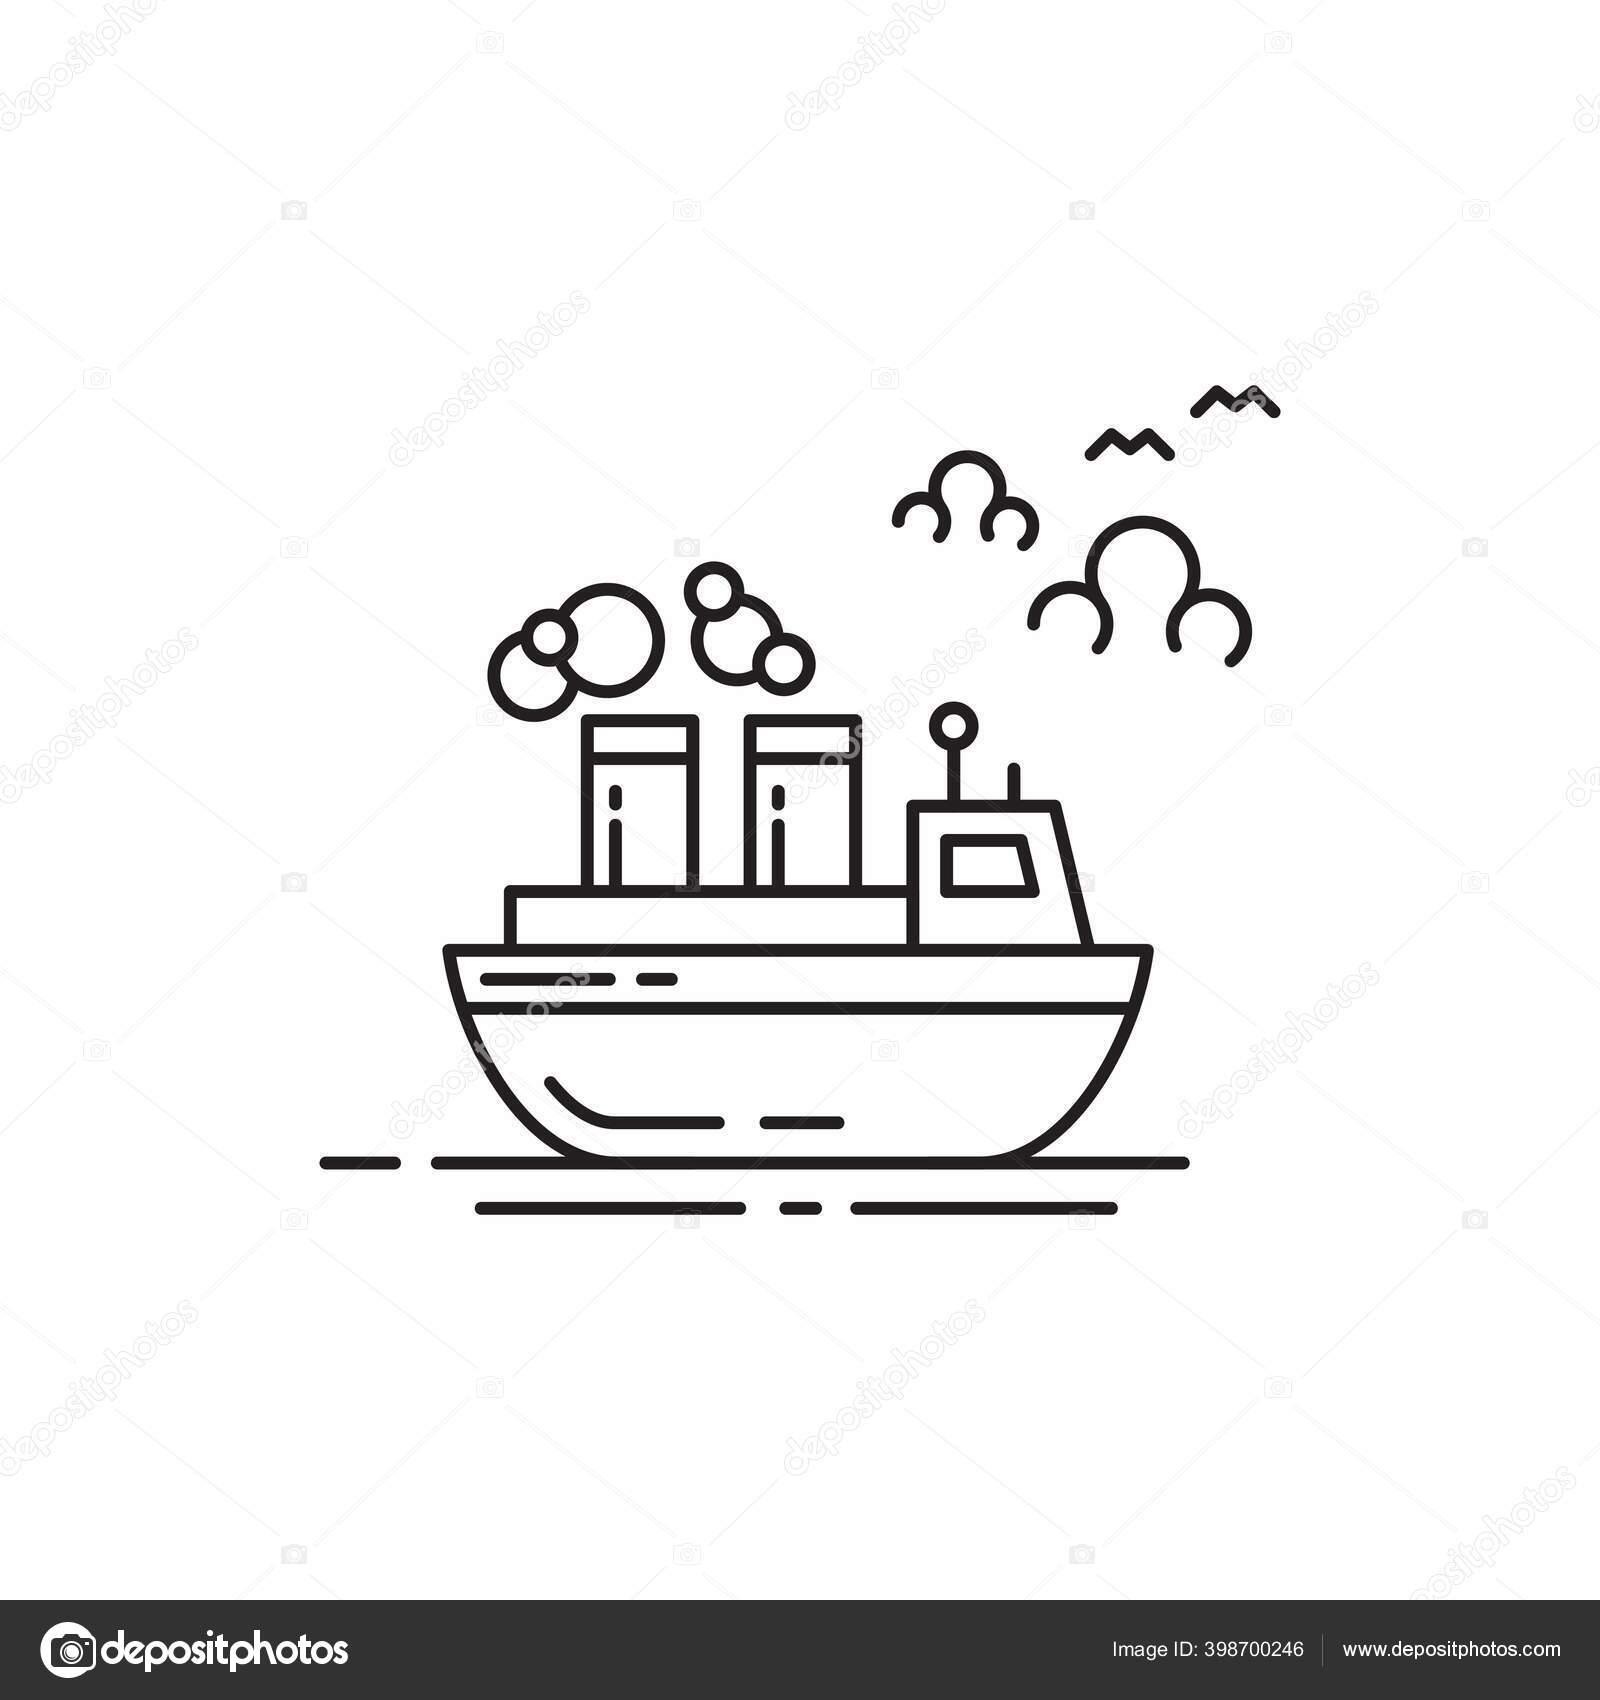 Ferry Simple Line Art Design Vector Untuk Penggunaan Transportasi Stok Vektor C Fitriyatunnasukhah Gmail Com 398700246